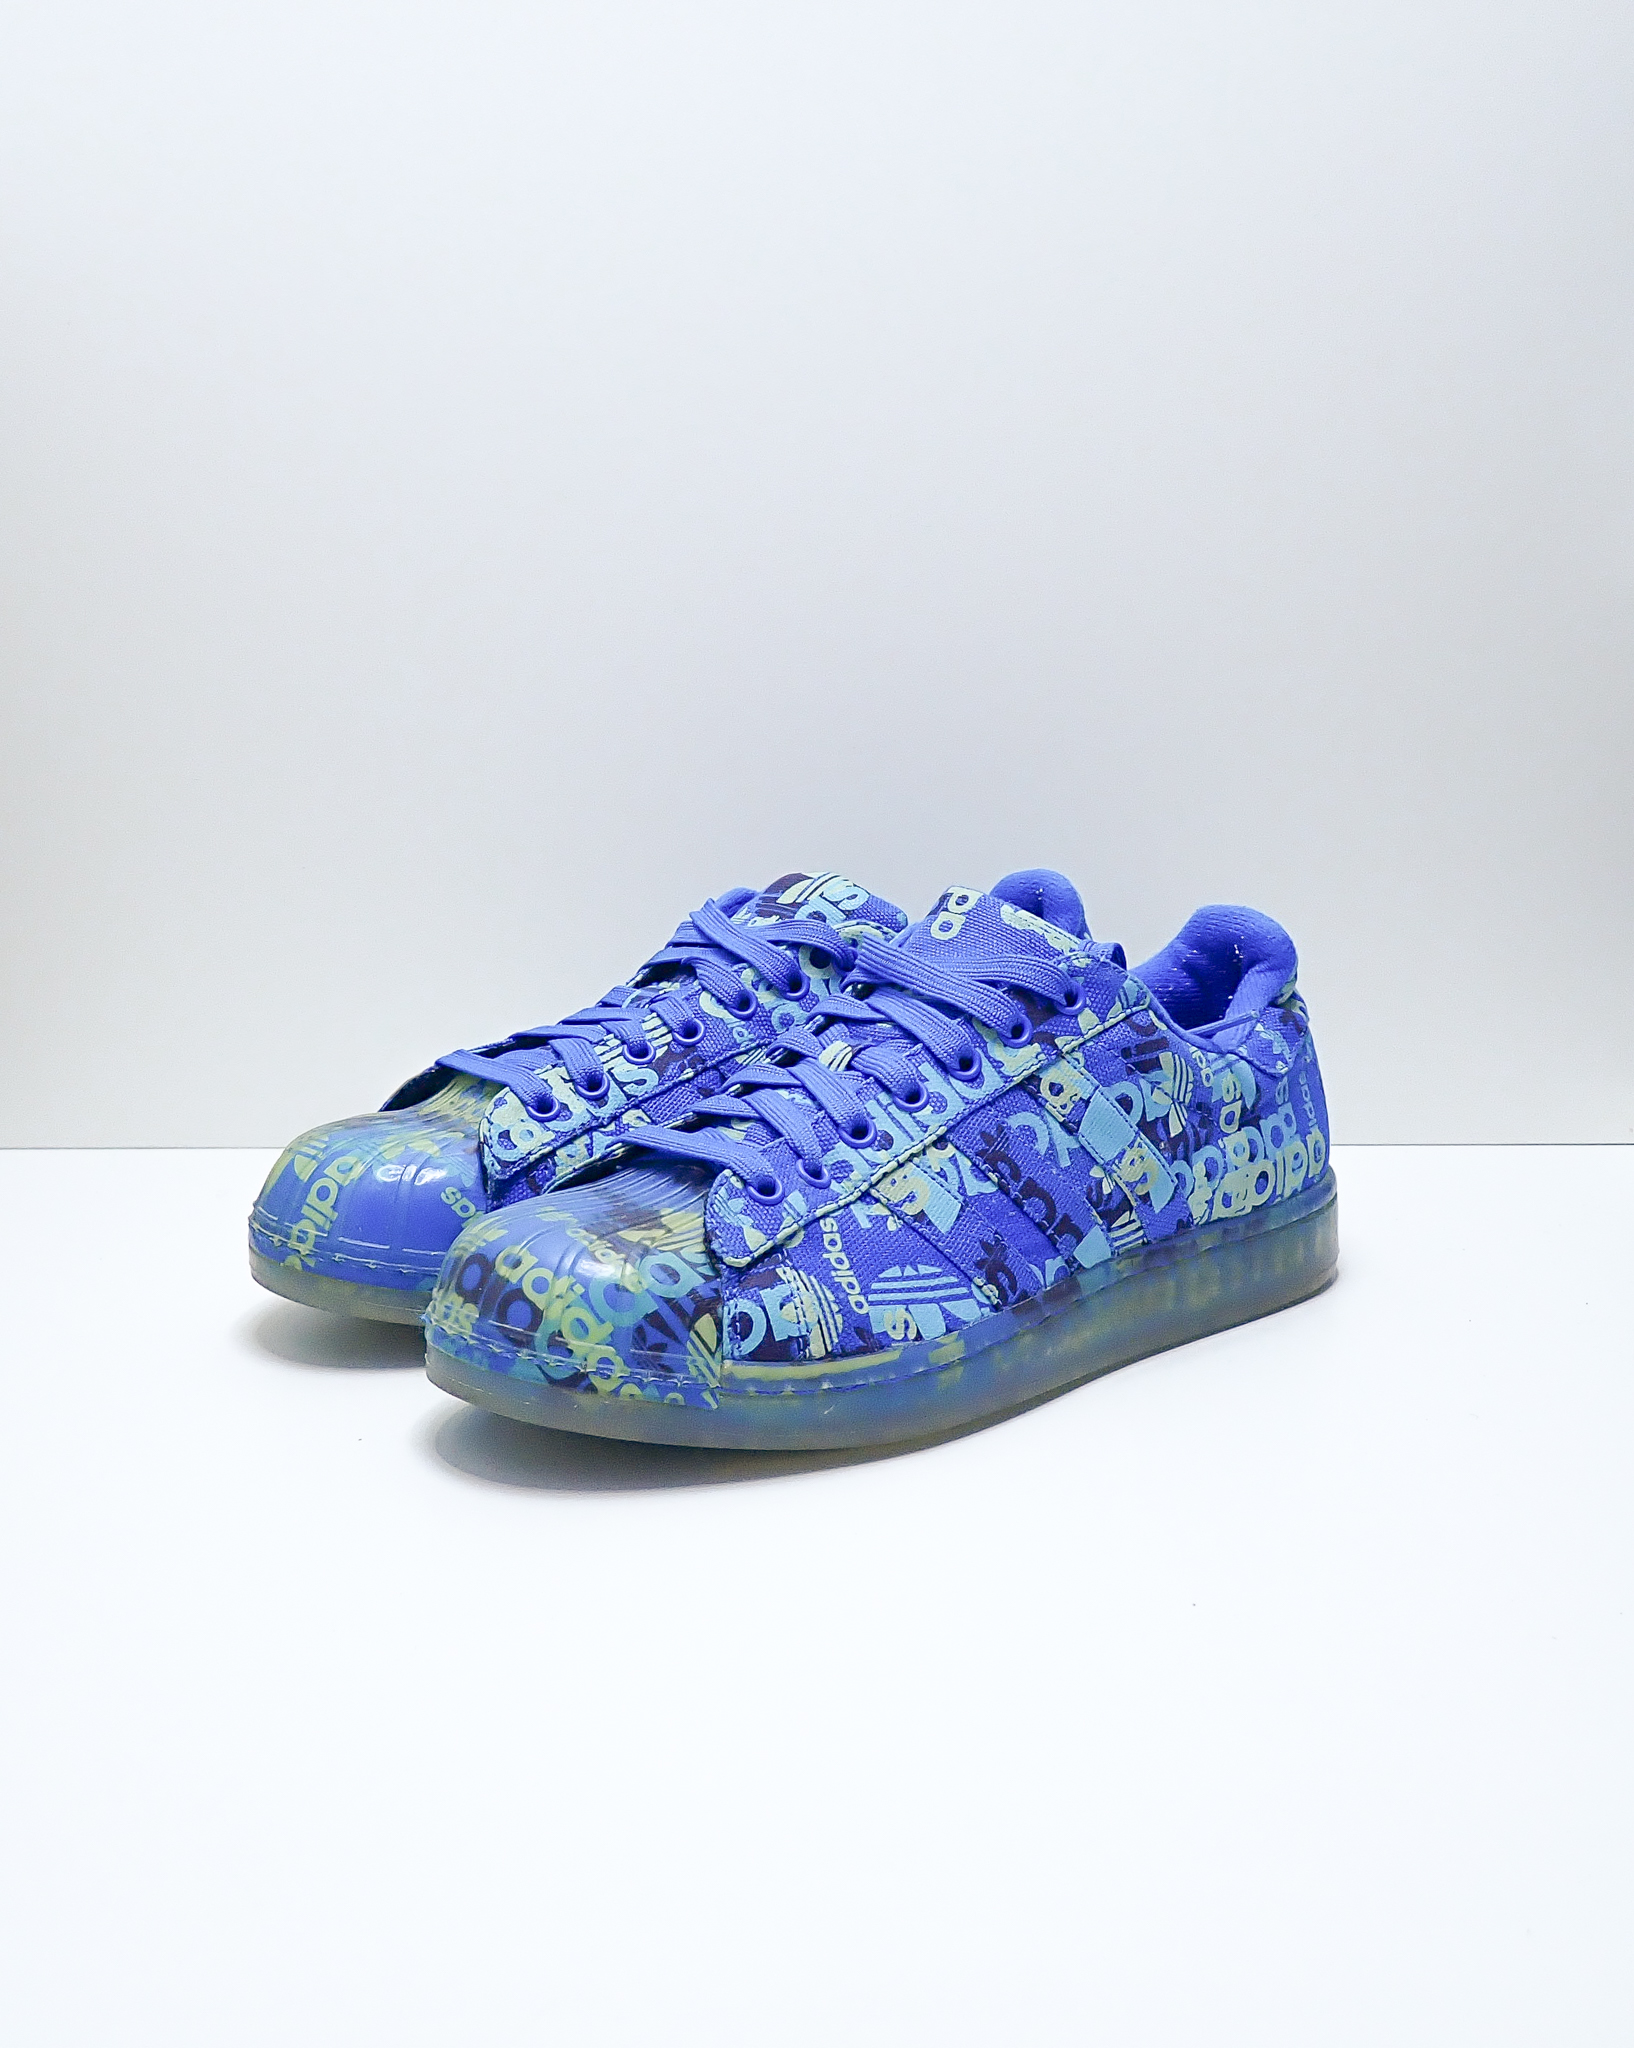 Adidas Superstar Clr